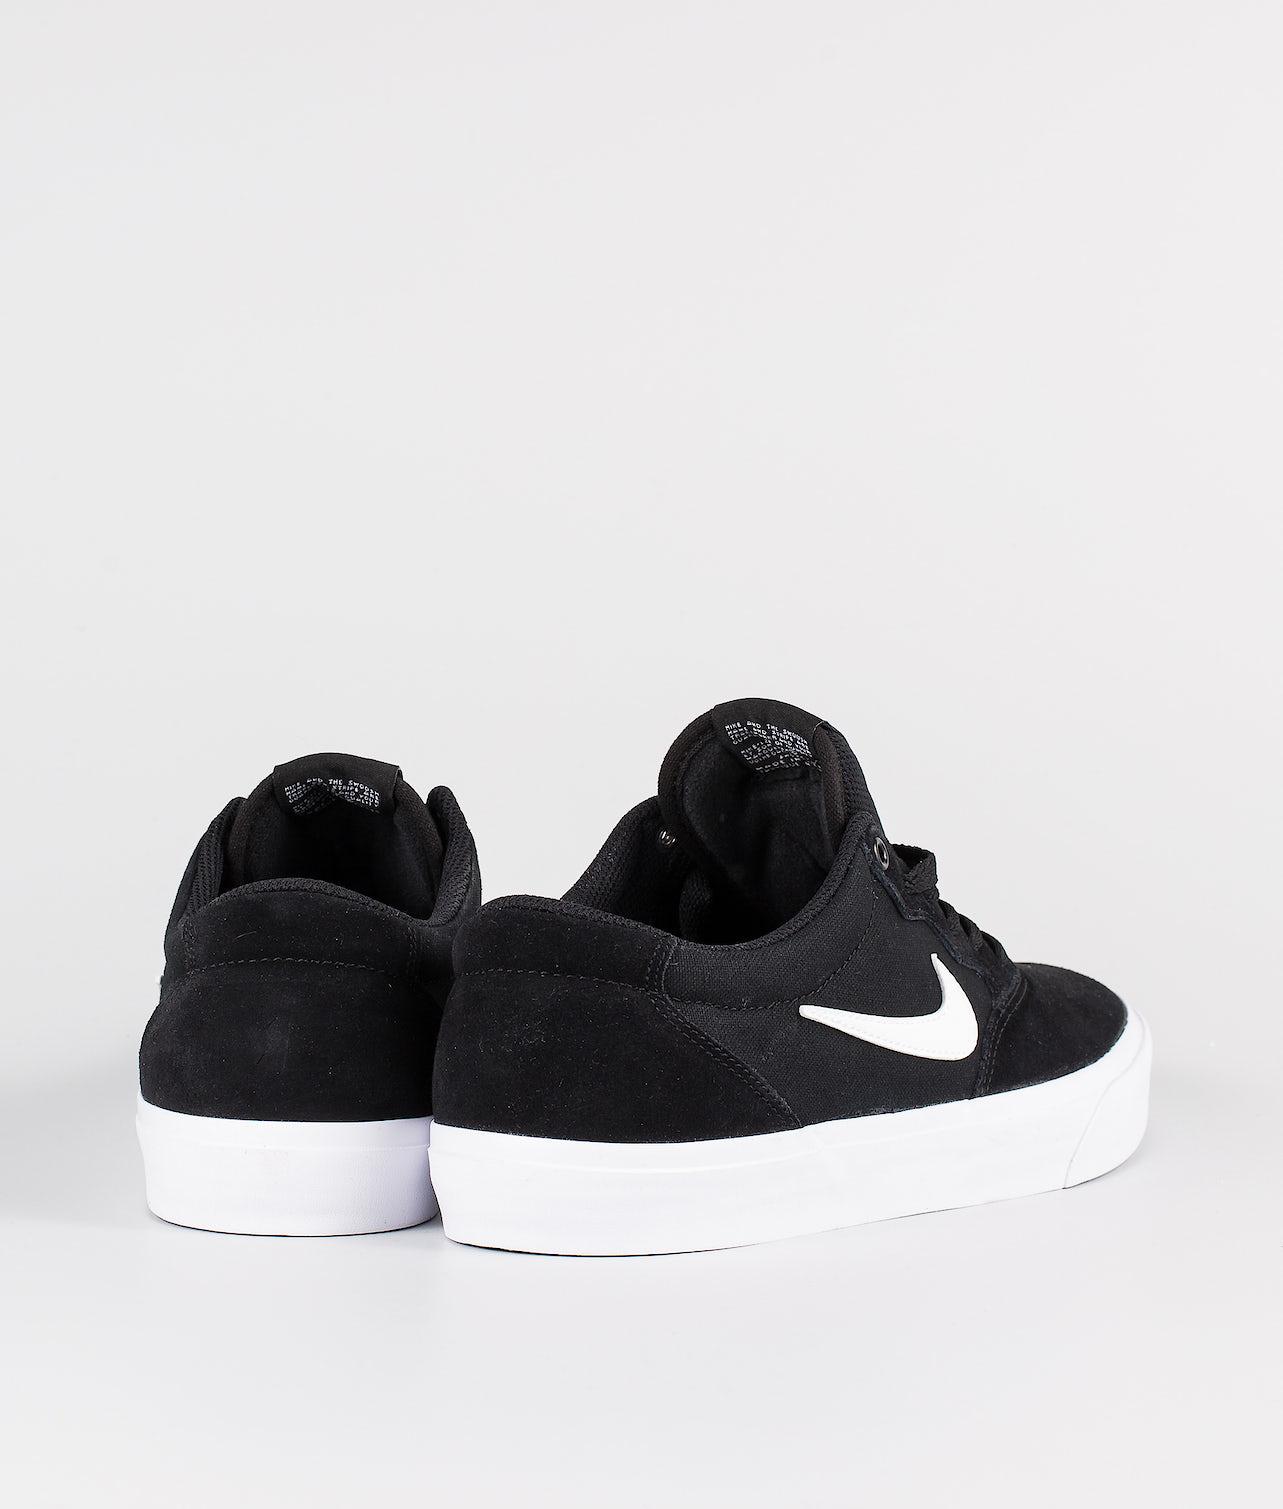 Nike SB Chron SLR Sko Black/White